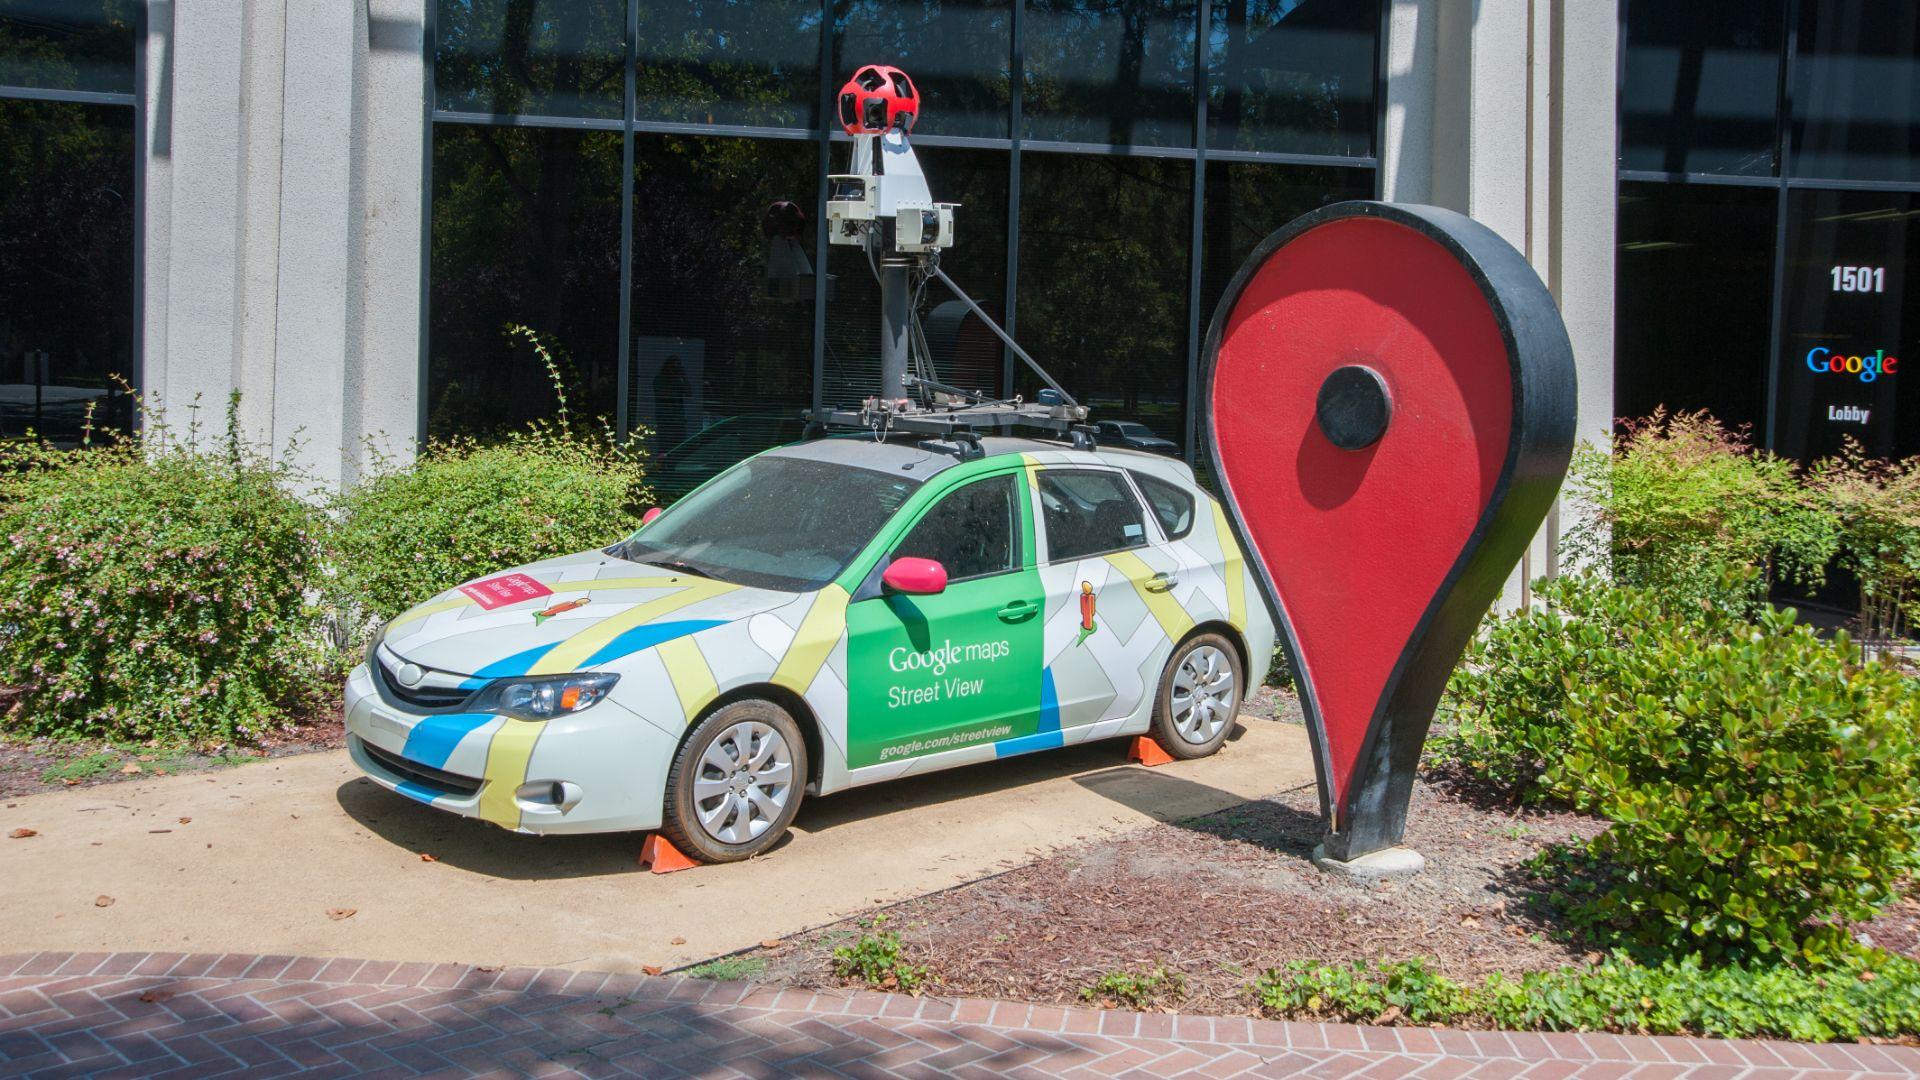 Google Street View cars clock up 10 million miles